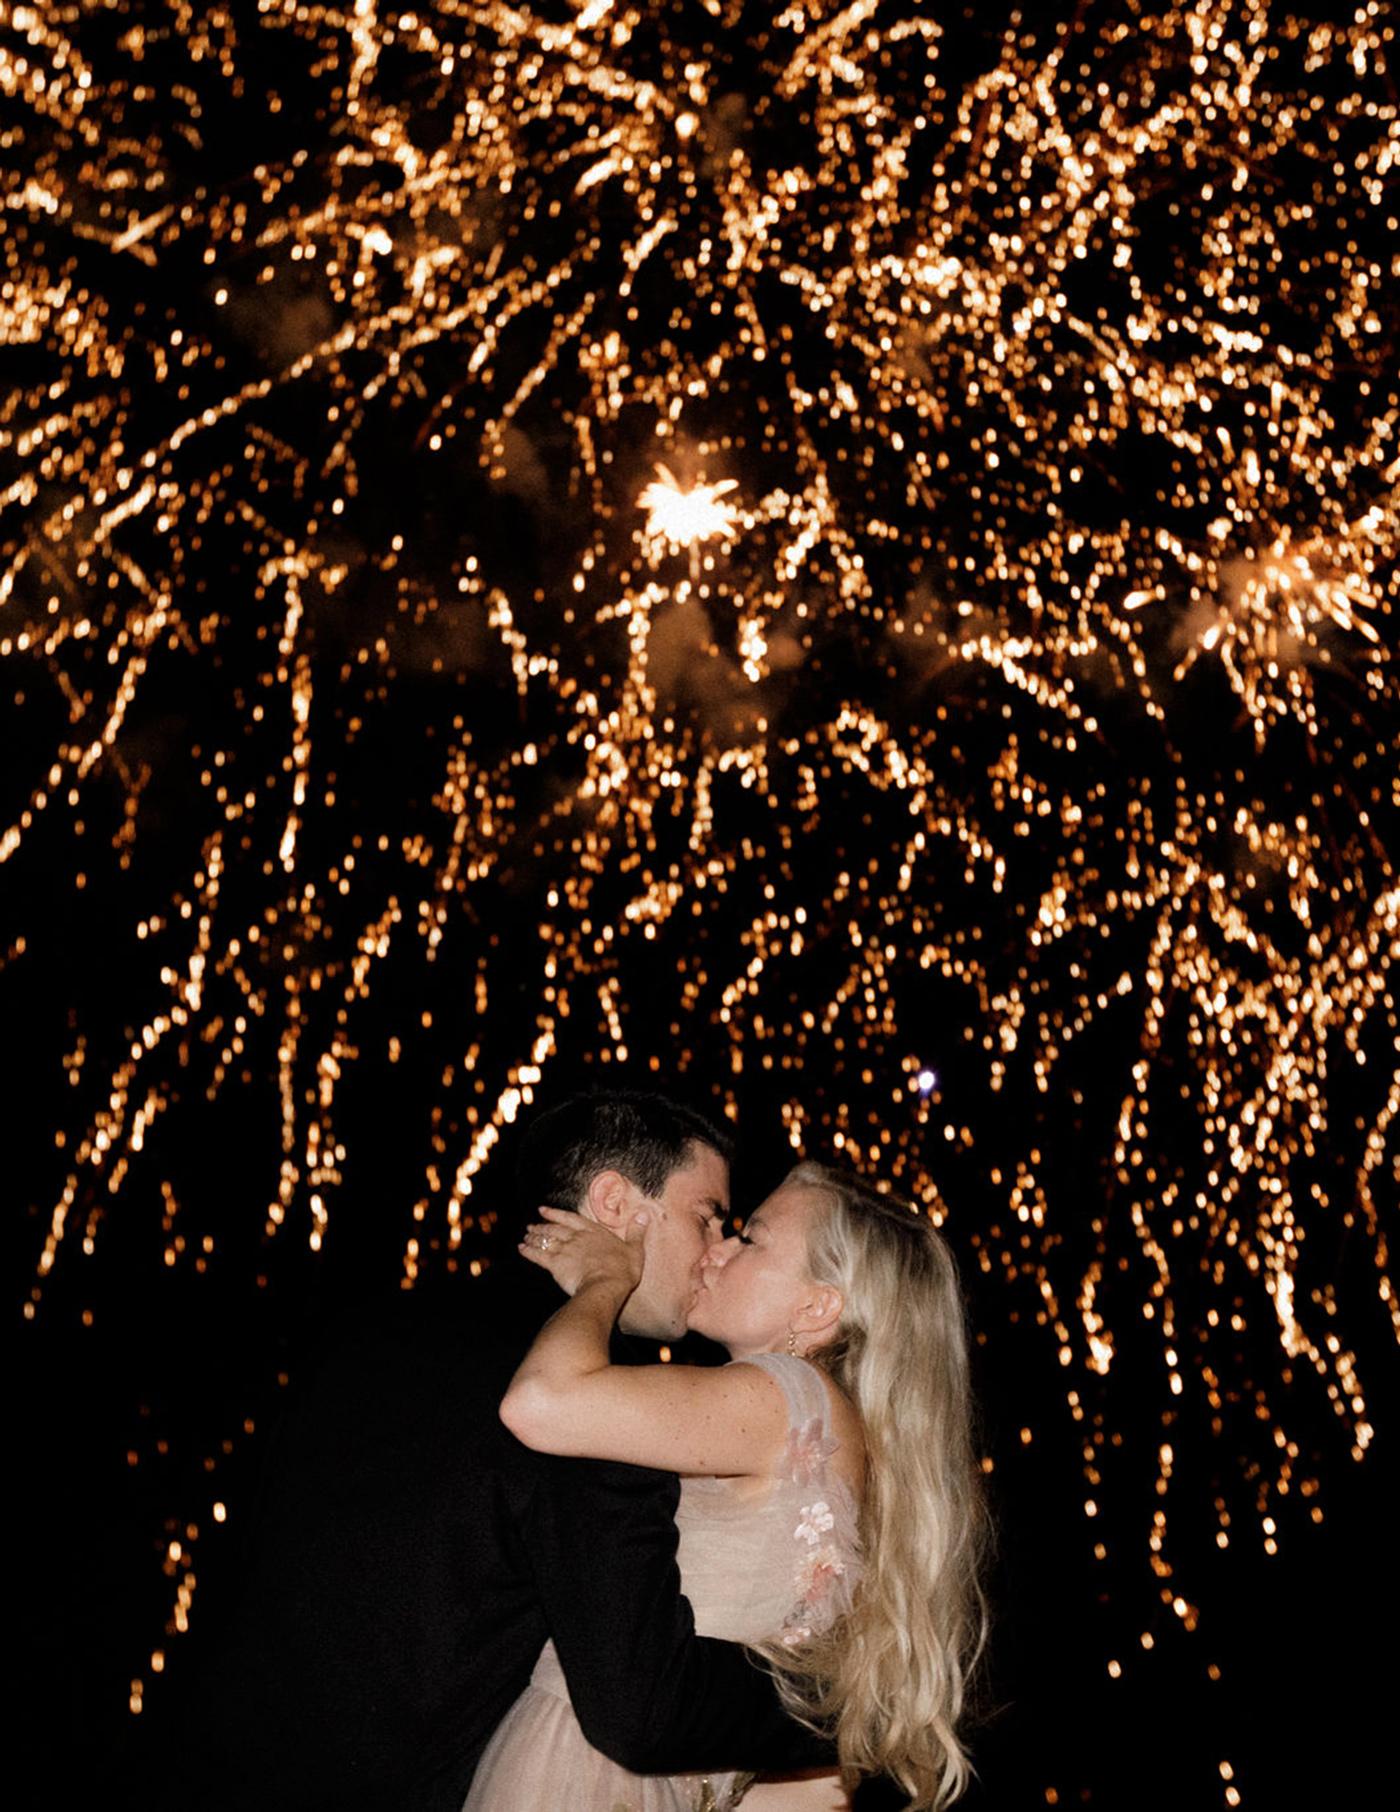 night shot wedding couple kissing under fireworks